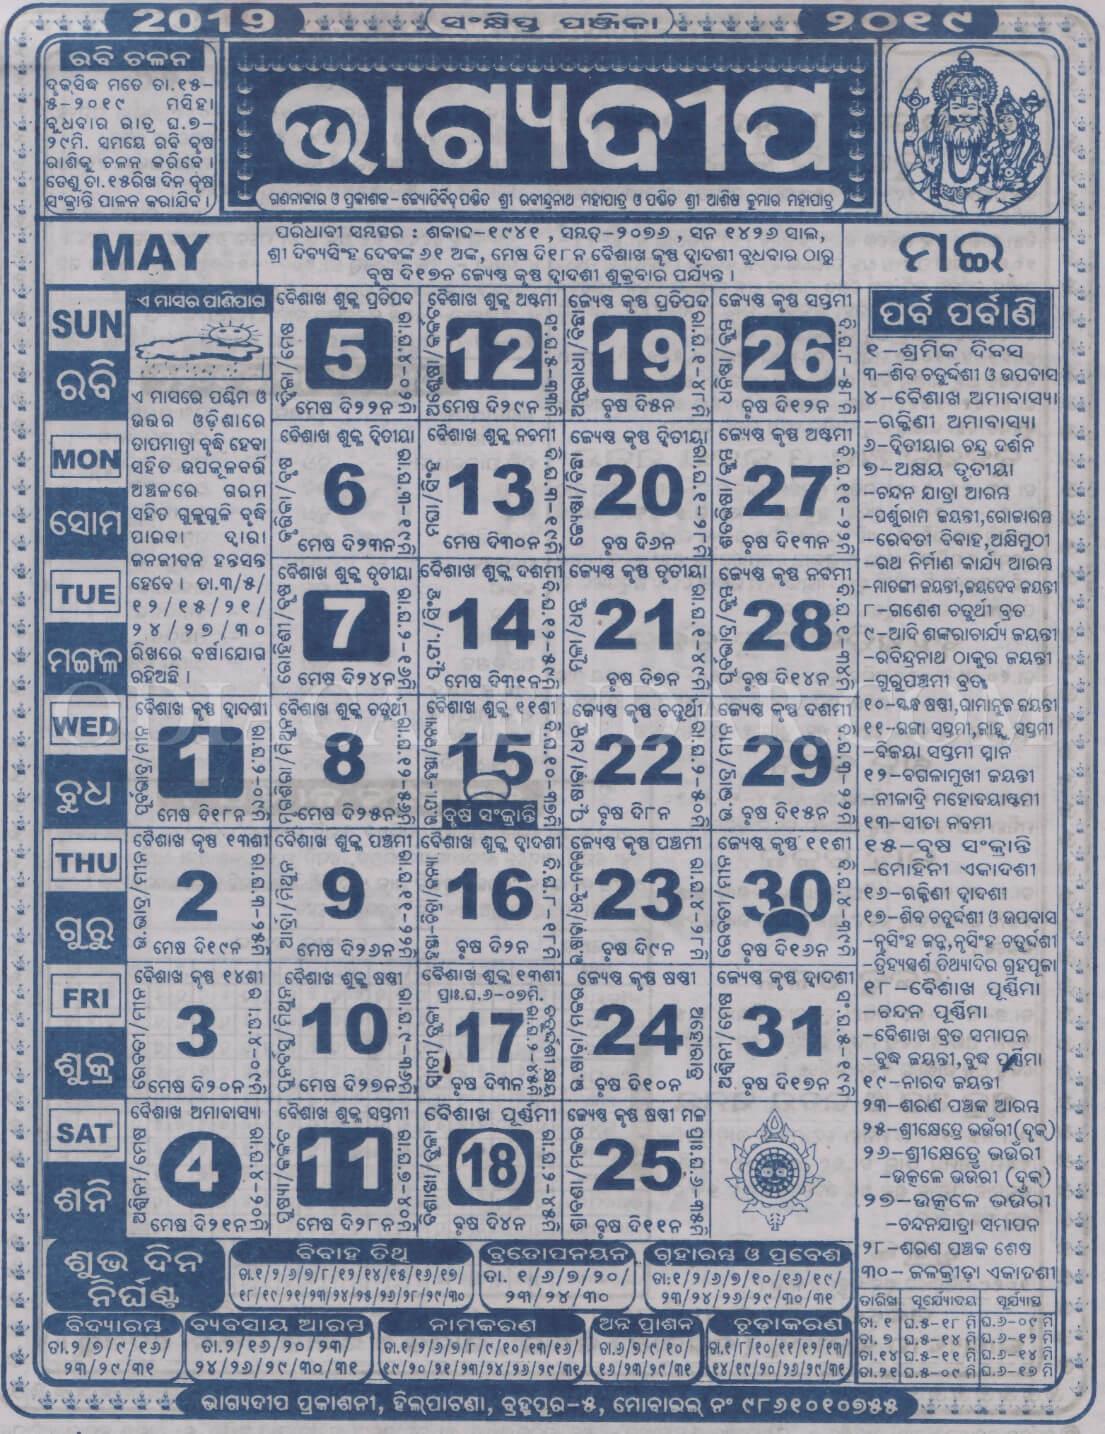 Bhagyadeep Odia Calendar 2019 | Odia Calendar 2019 | Odia with regard to Odia Calendar Bhagyadeep